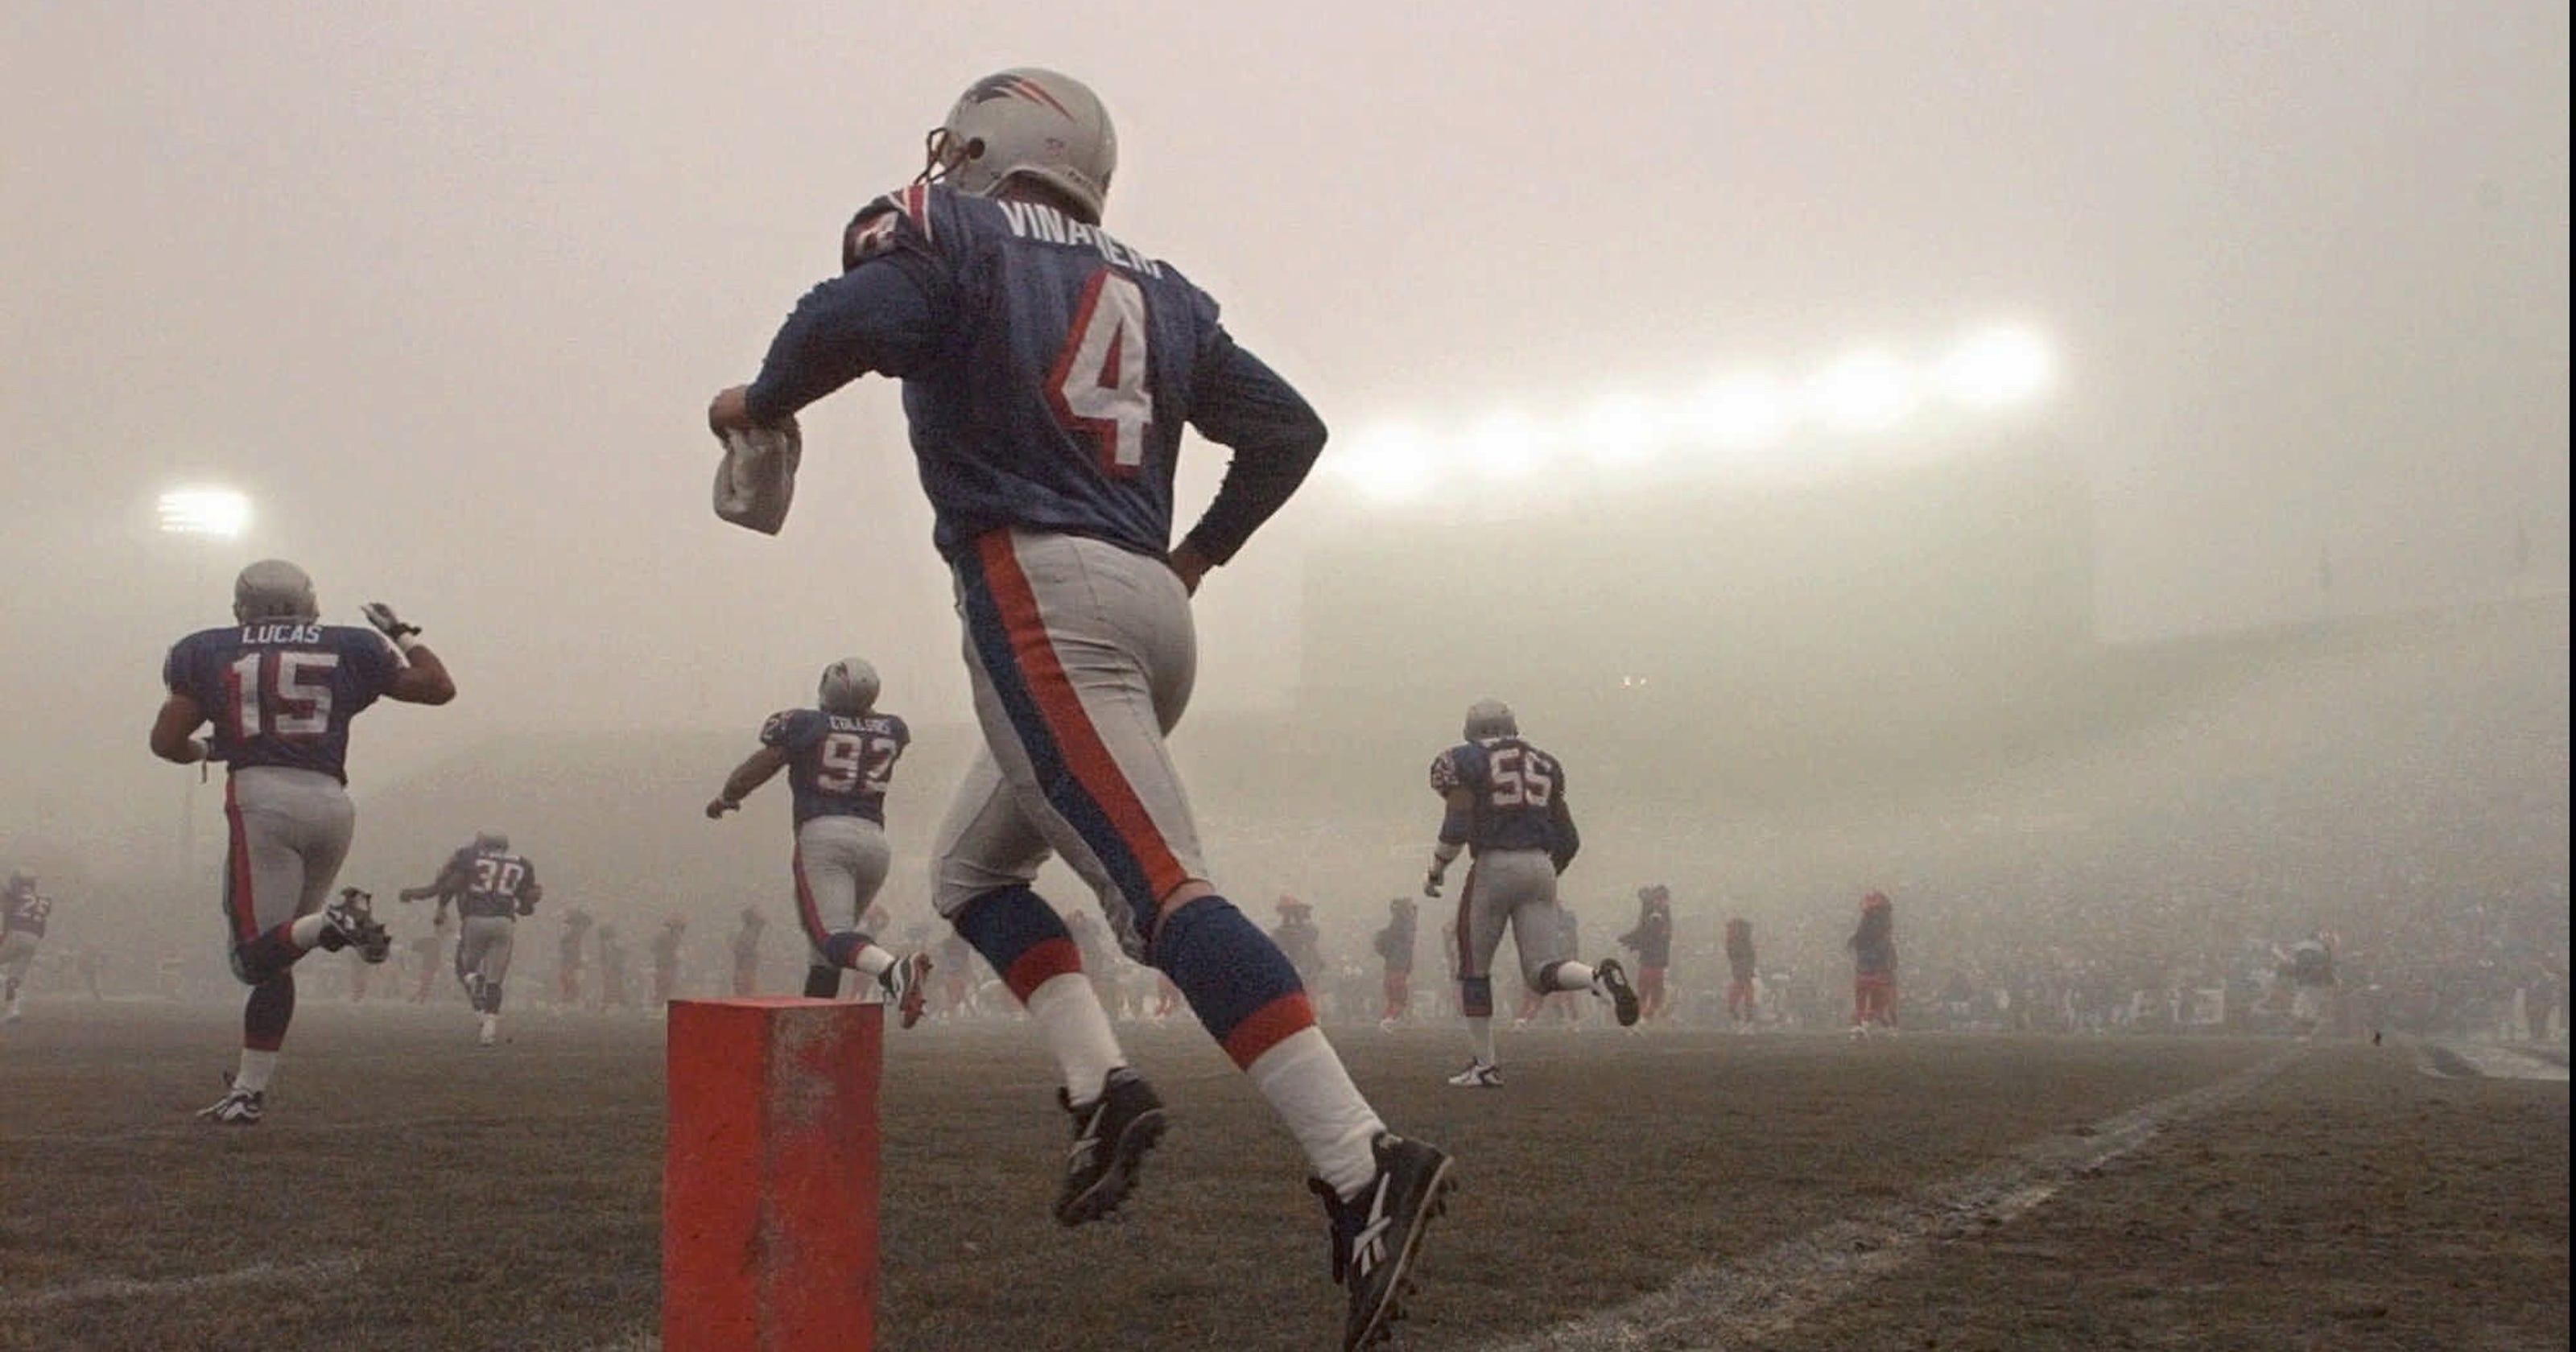 1a69655cc9b Indianapolis Colts: The kick that saved Adam Vinatieri's career